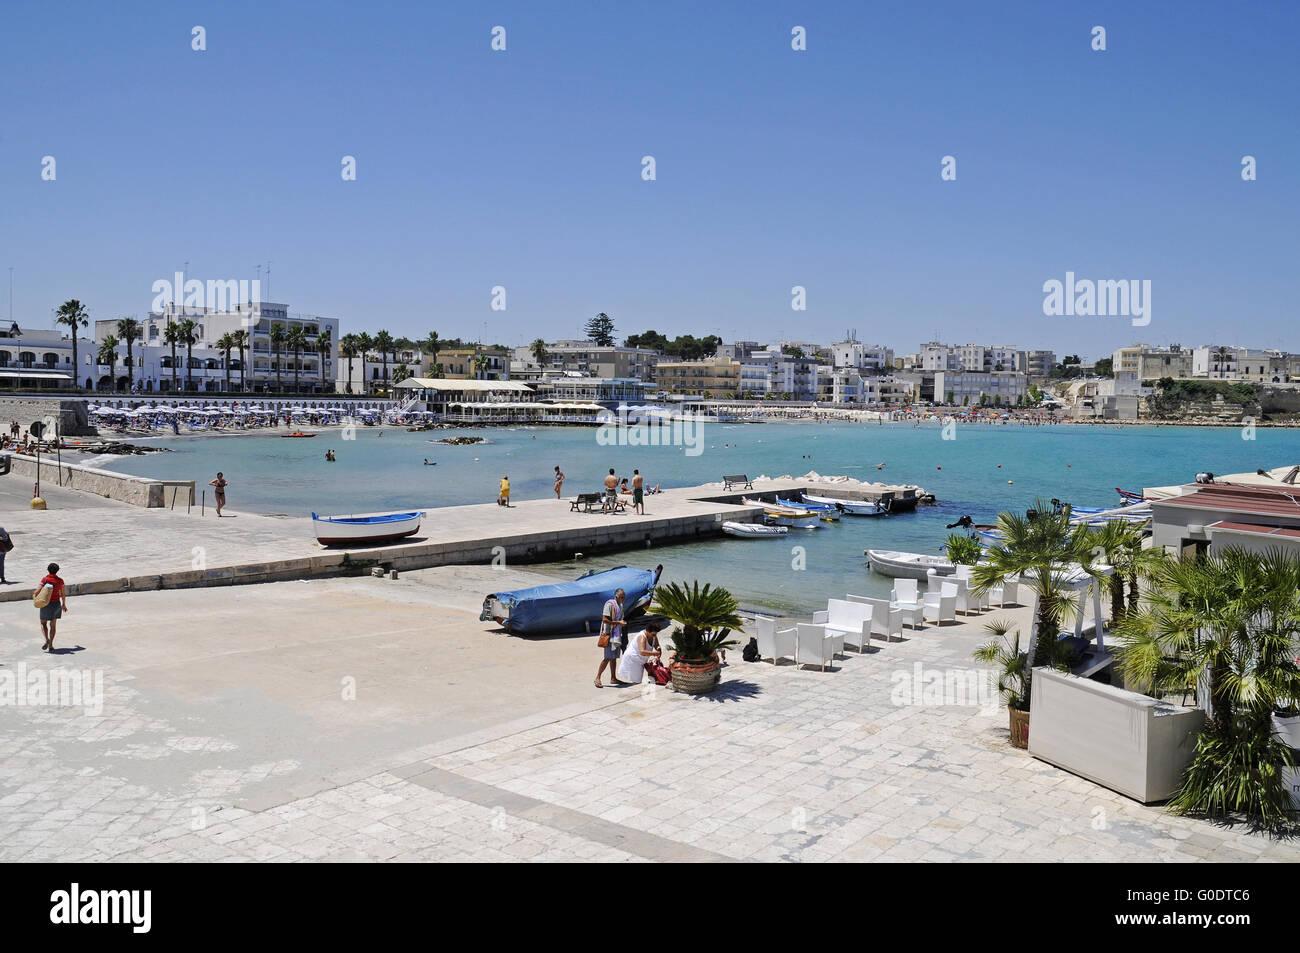 waterside promenade, Otranto, Italy - Stock Image